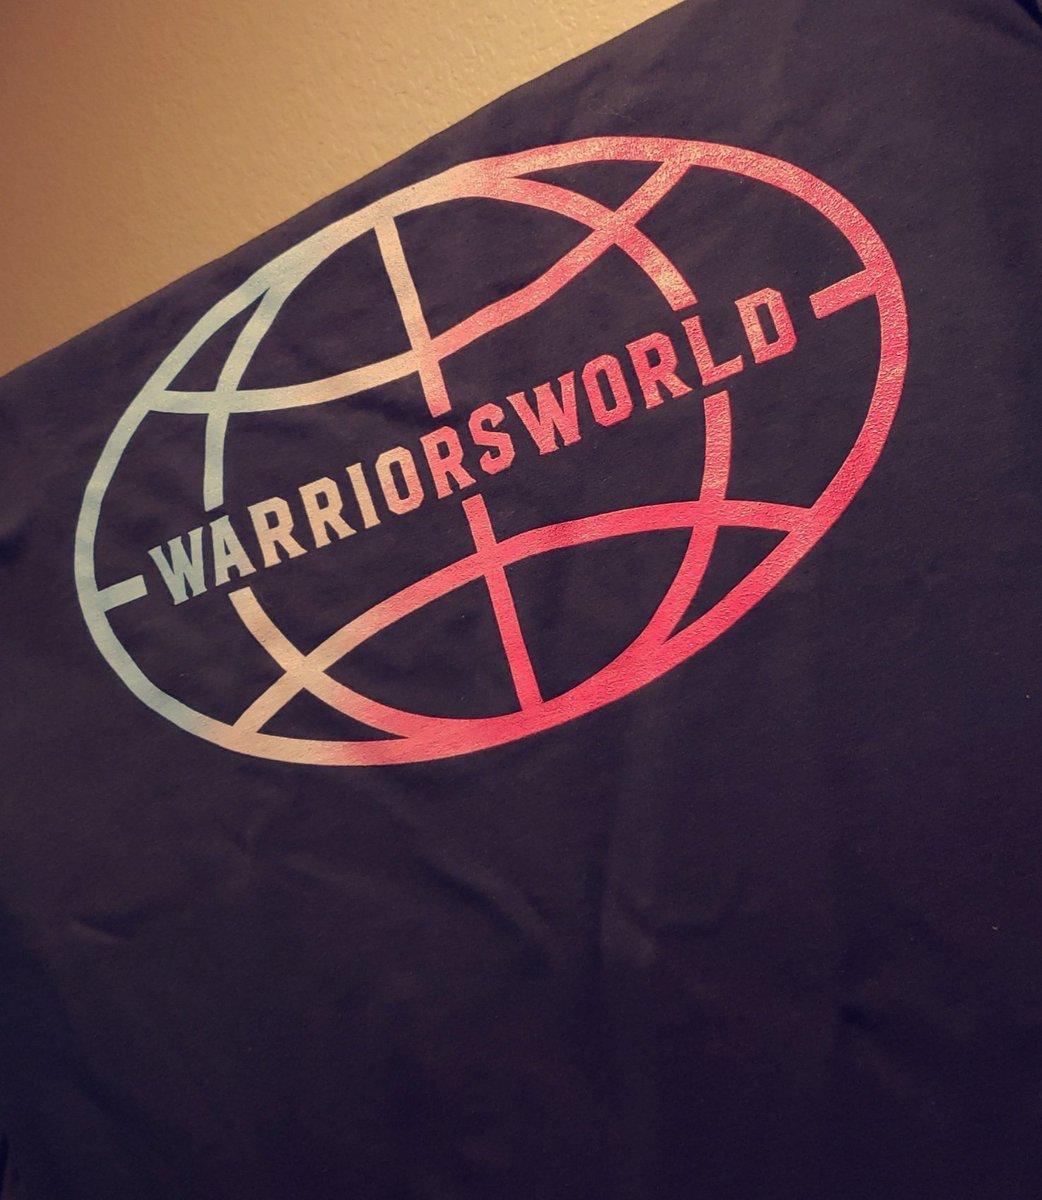 Vhurwcx 7io Zm Welcome to the new warriorsworld subredditmain (self.warriorsworld). https twitter com warriorsworld lang gu 3flang 3dro